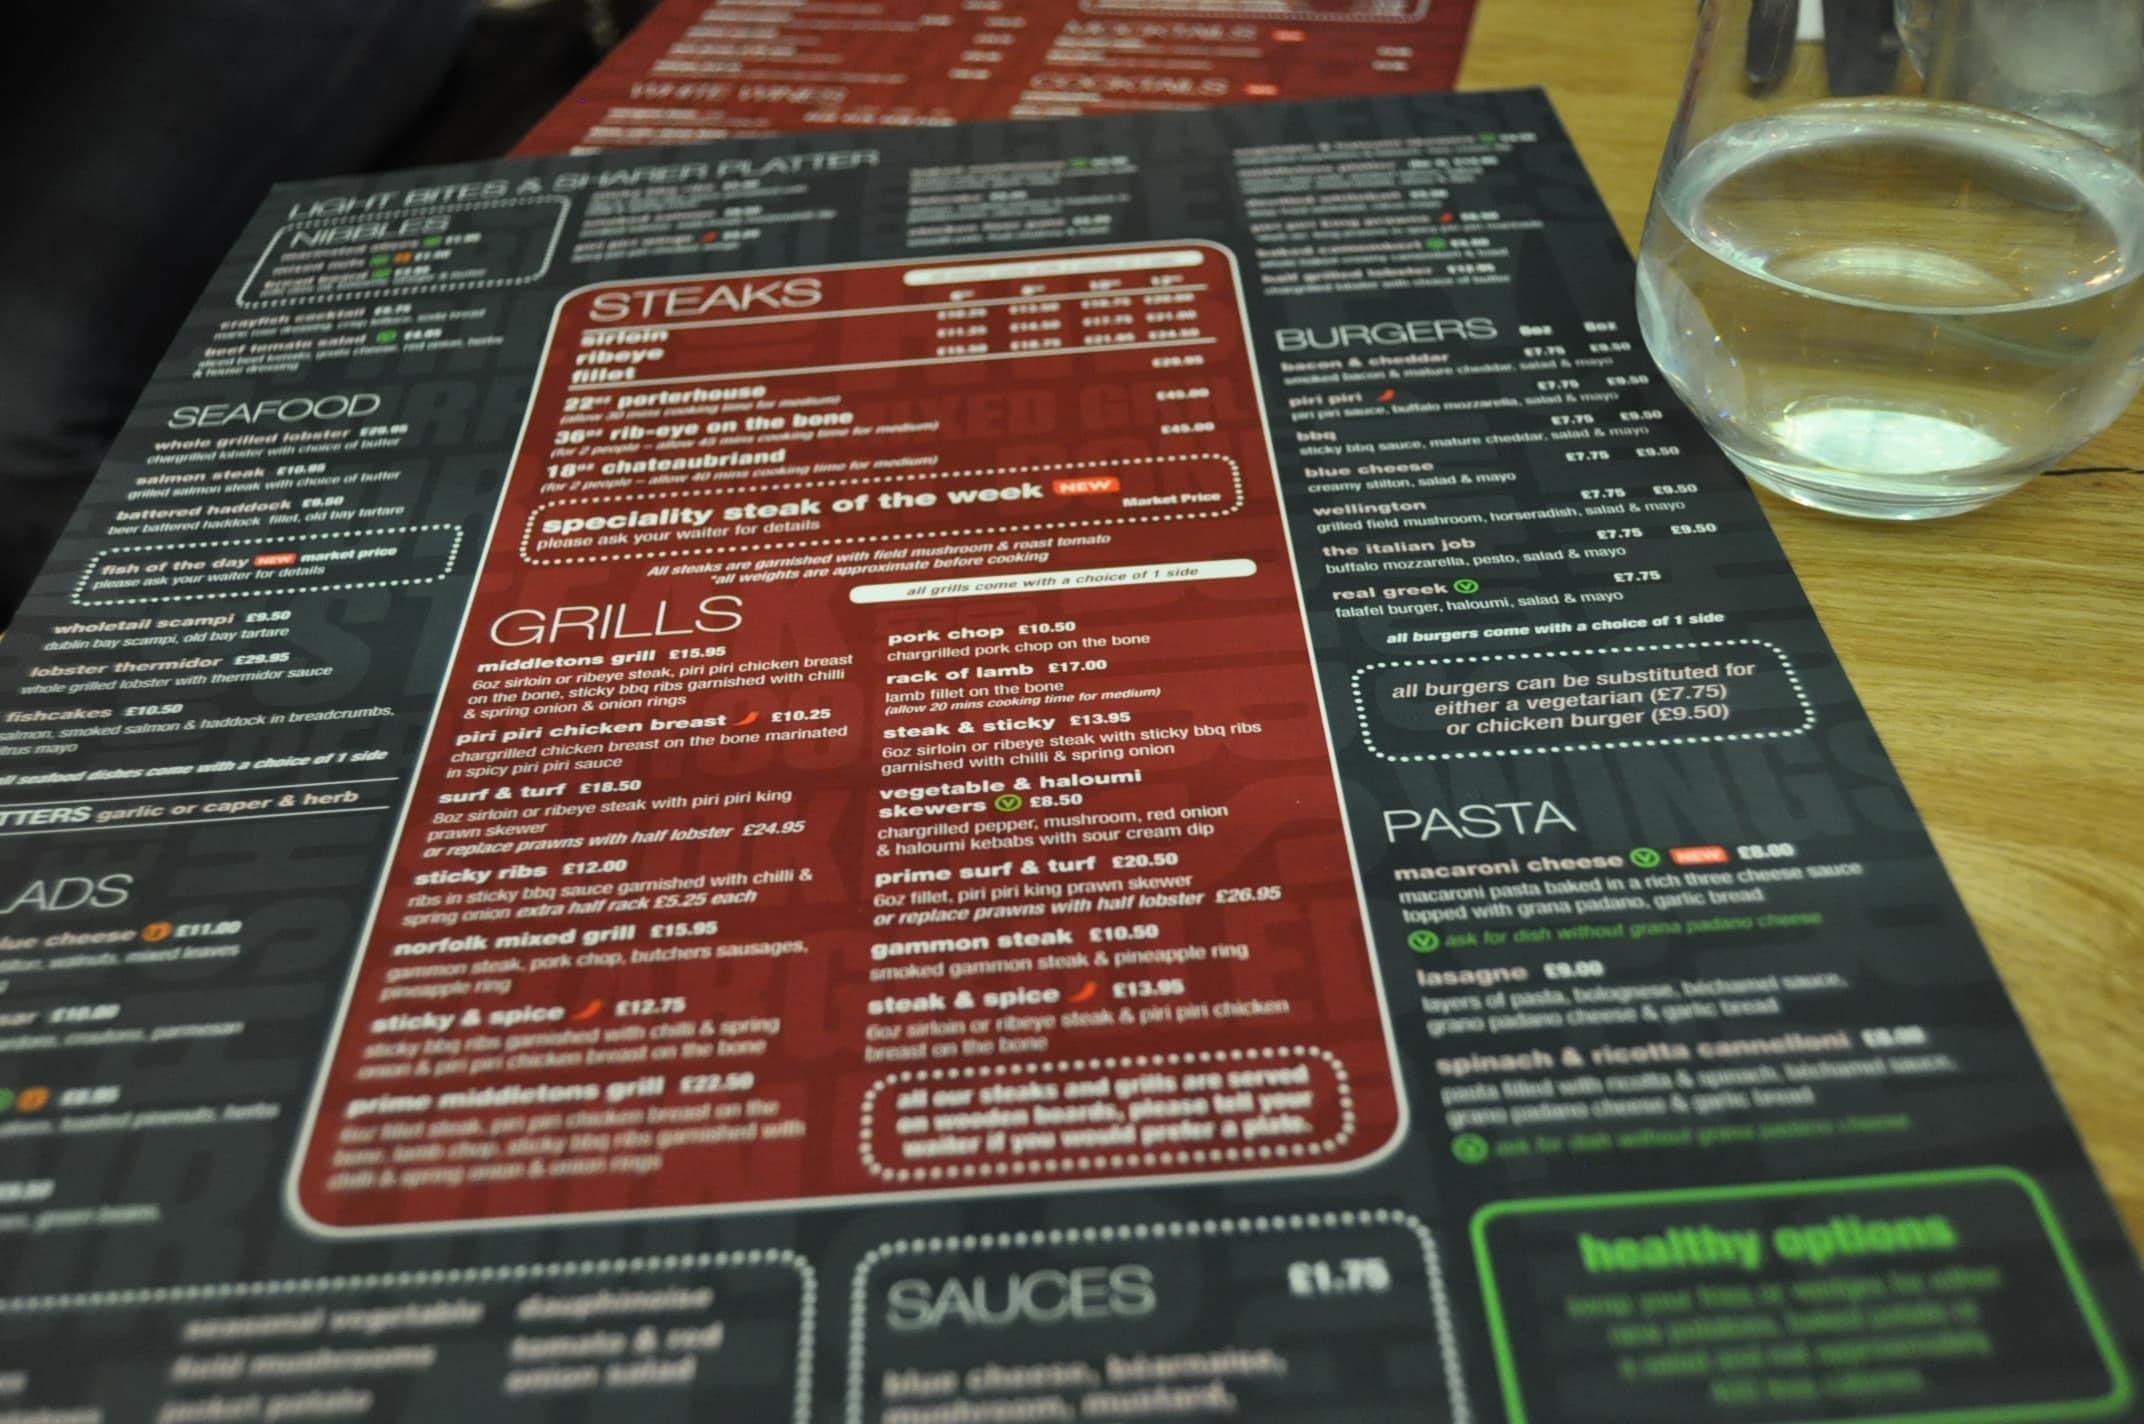 Middletons Steakhouse Milton Keynes menu